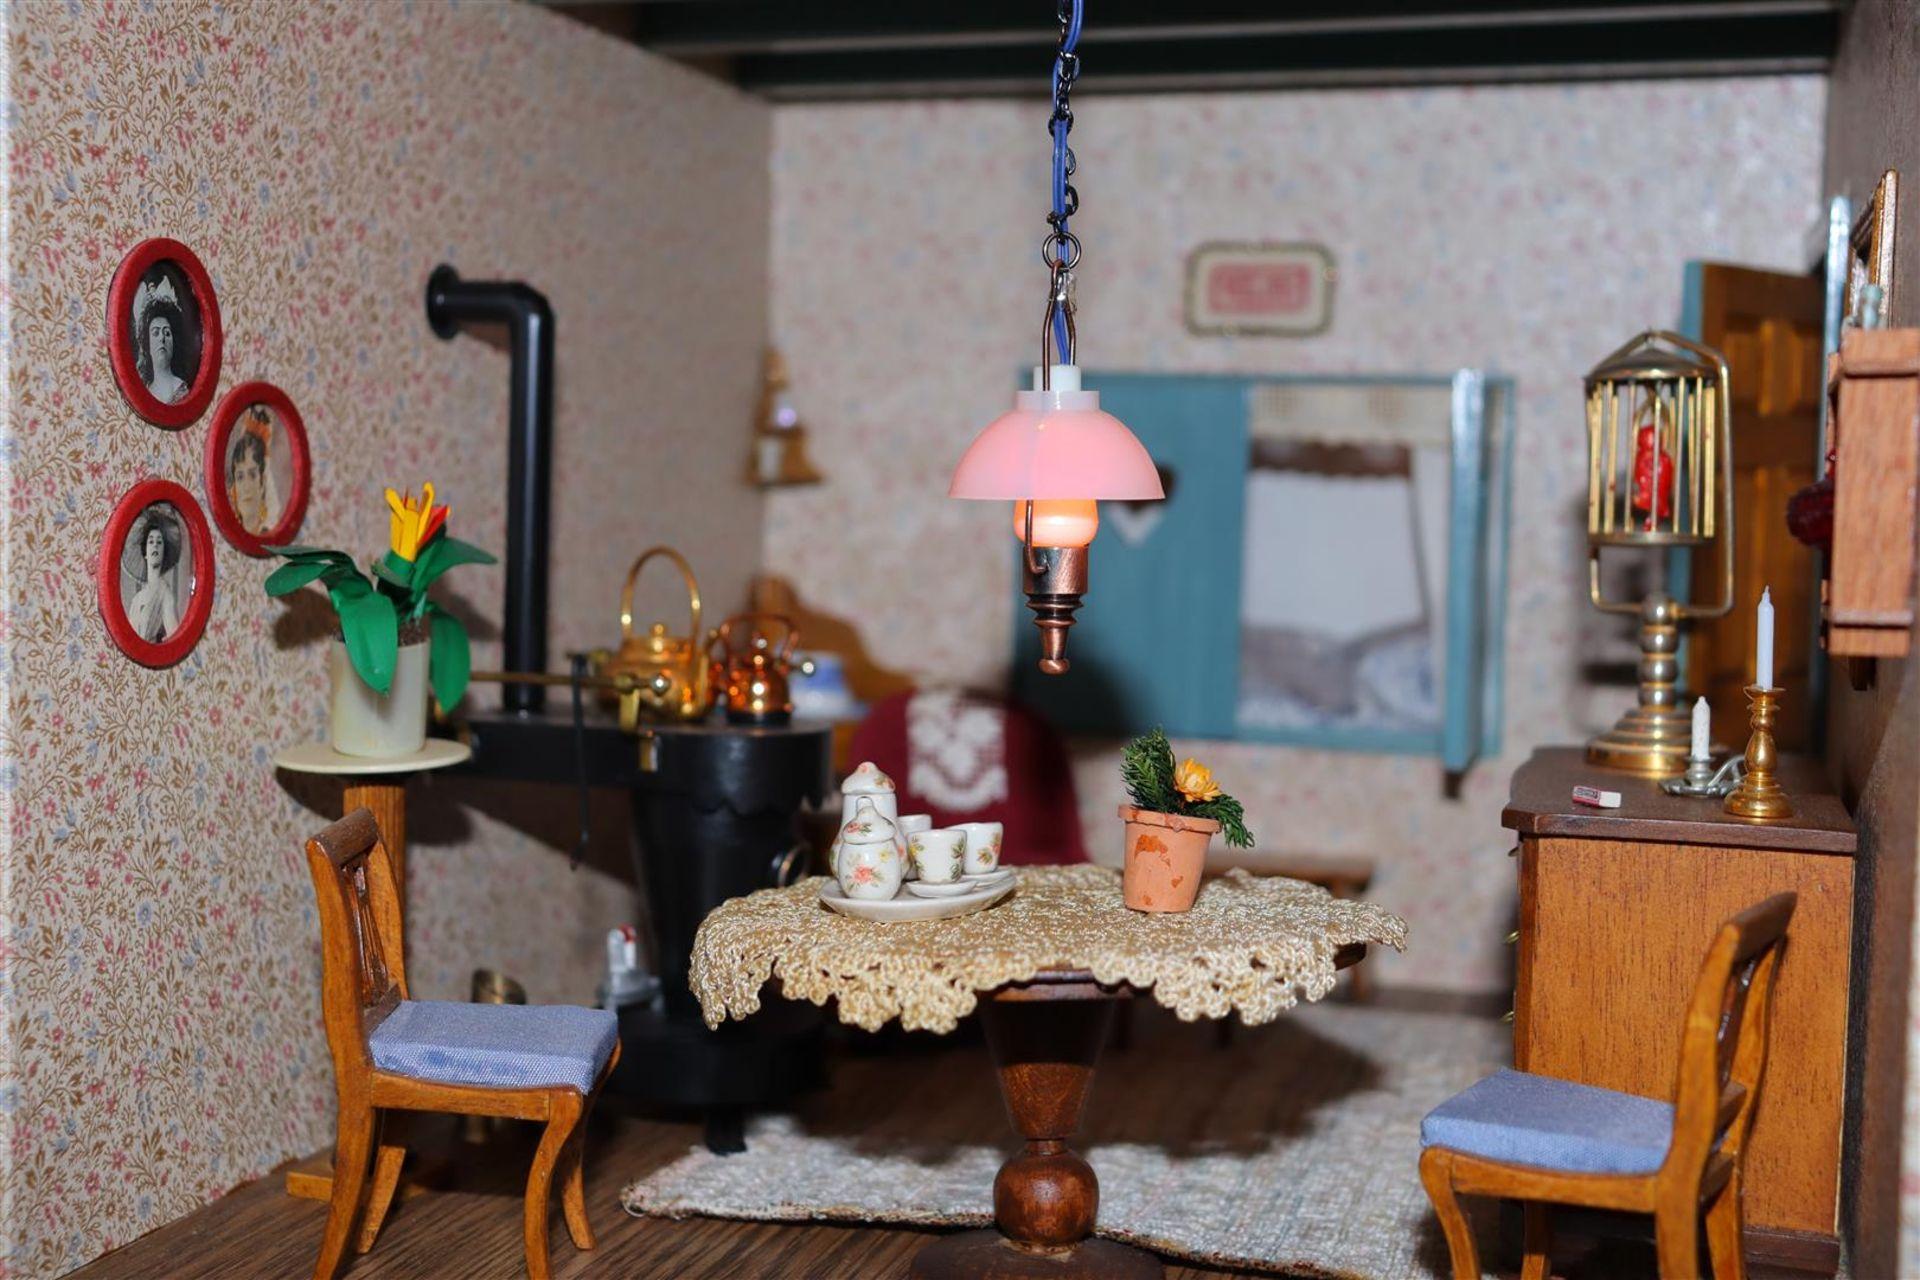 Dollhouse De Kettenborgh by Mrs. J C Wirix Kettenborg - Image 4 of 106